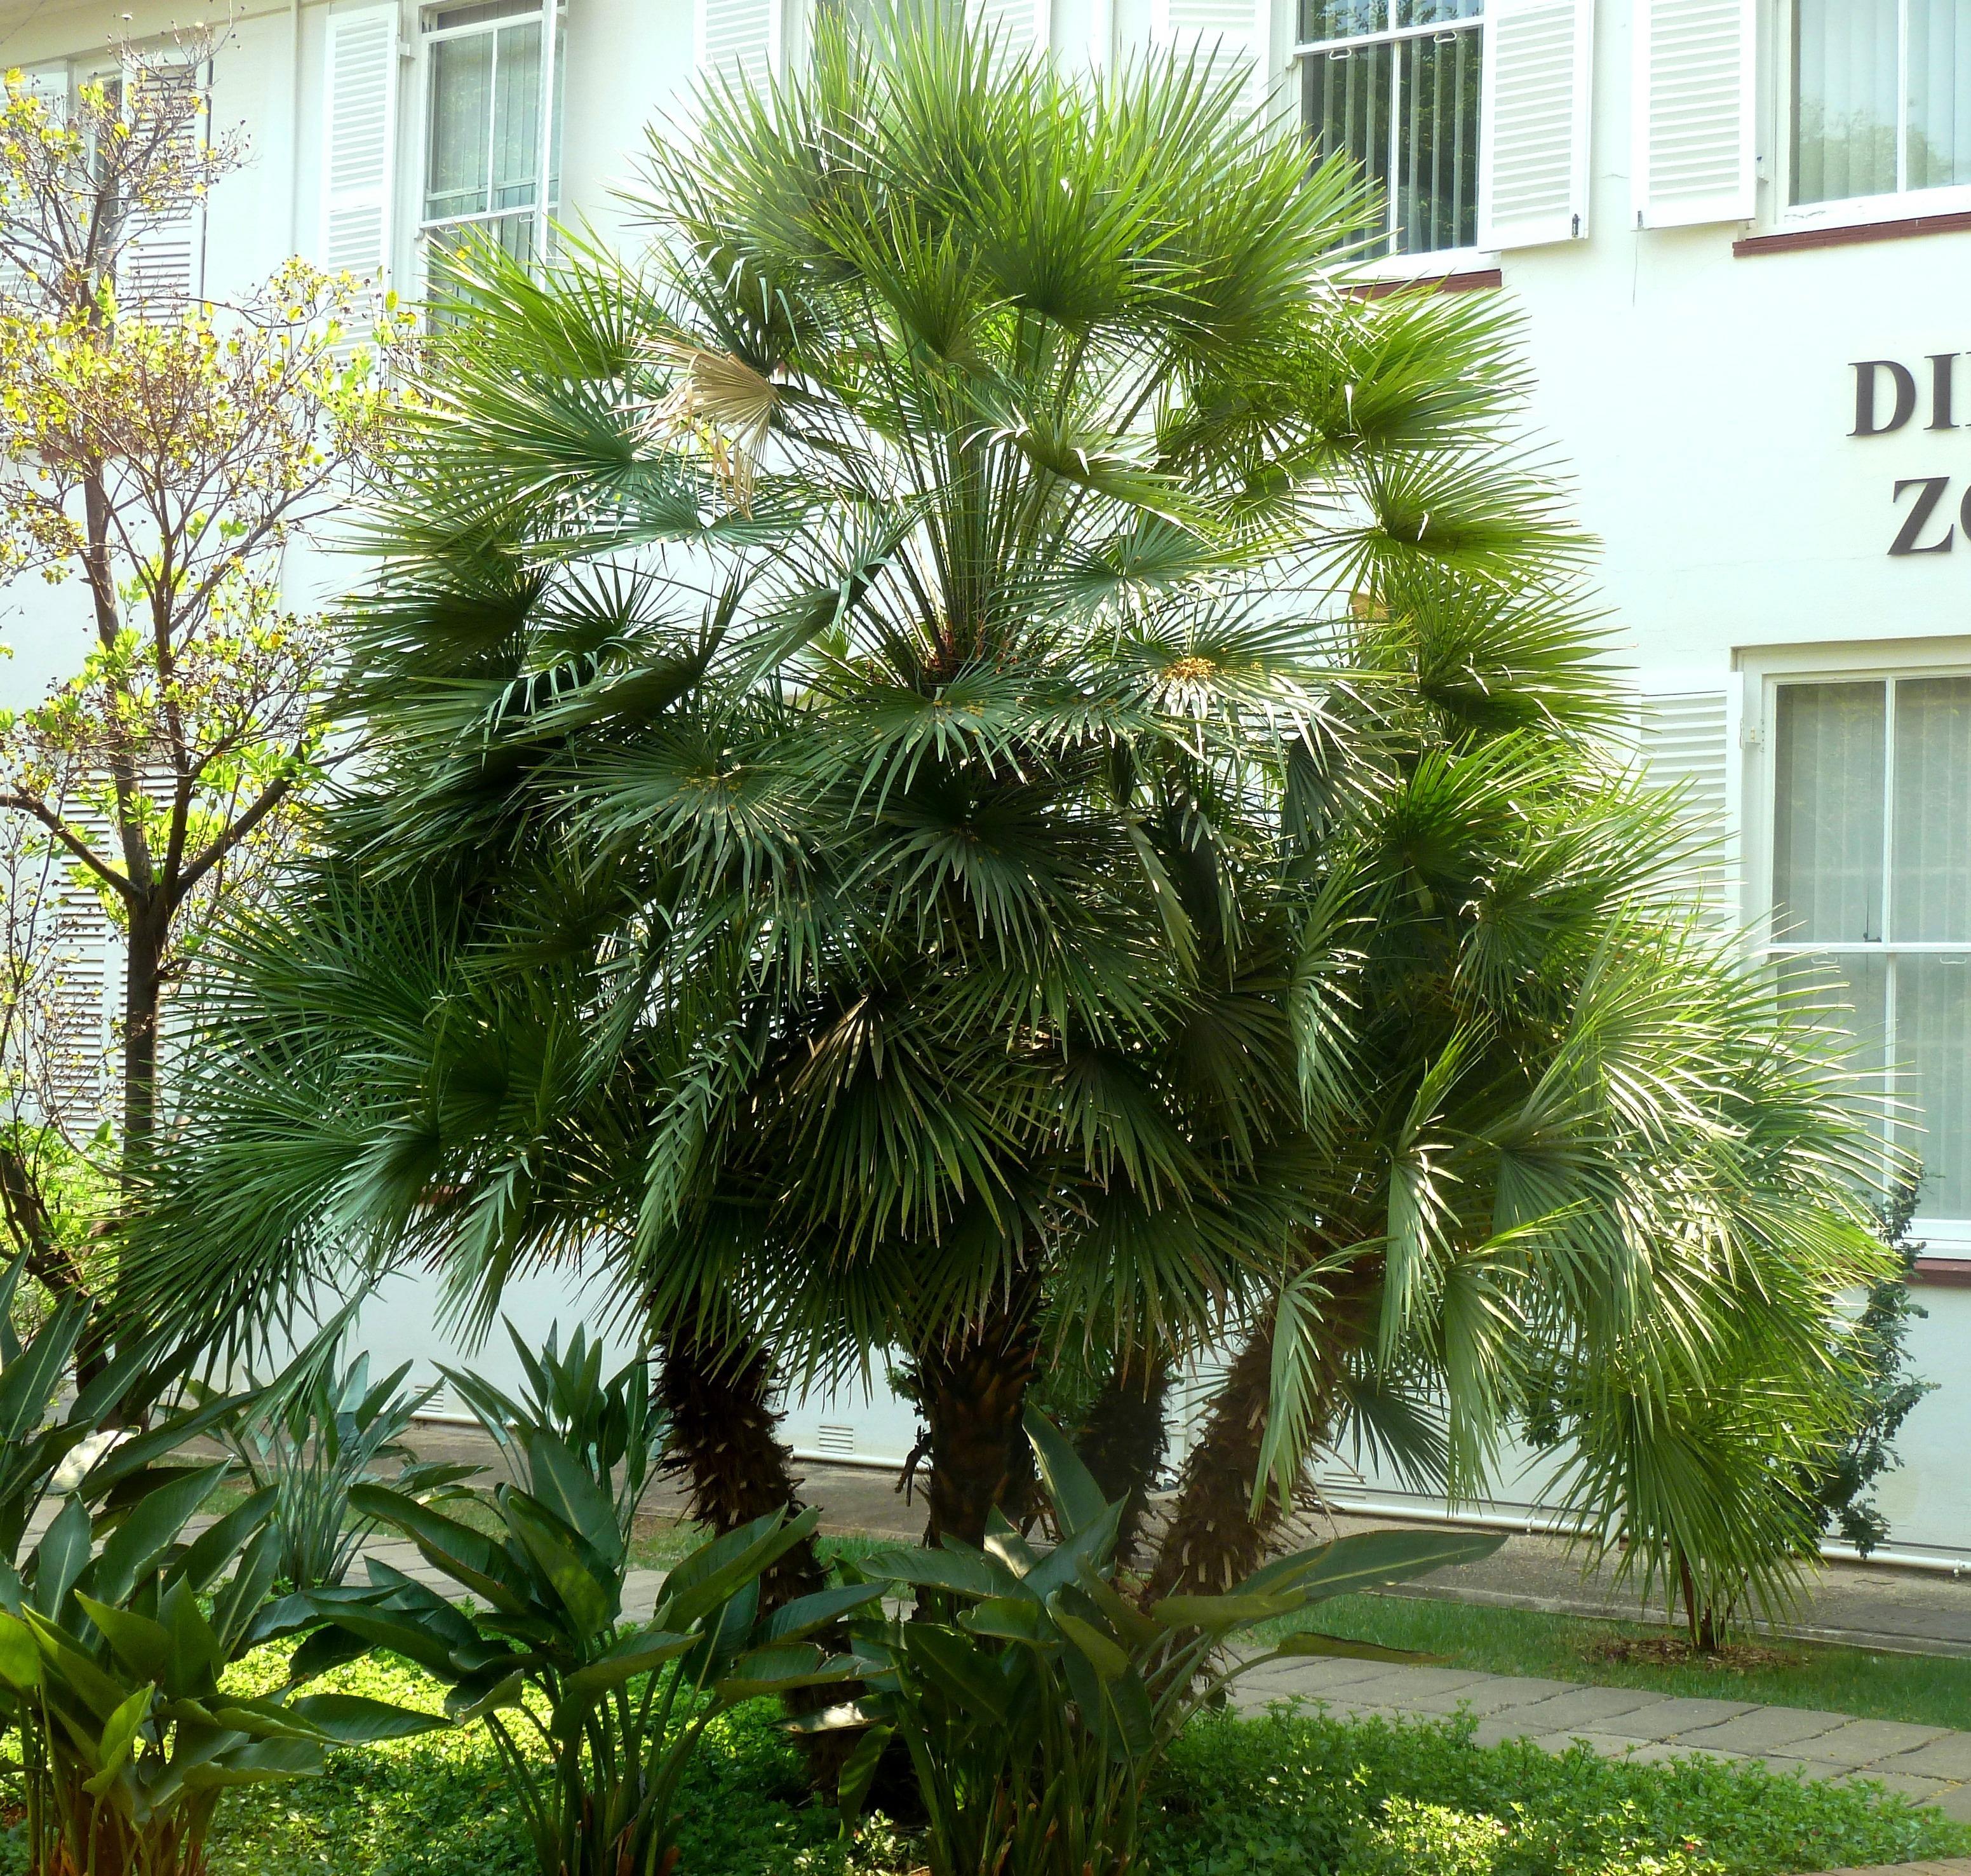 Chamaerops humilis, habitus, Tuks.jpg English: Habit of Mediterranean fan palm at the University of Pretoria Date 11 October 2015, 13:59 Source